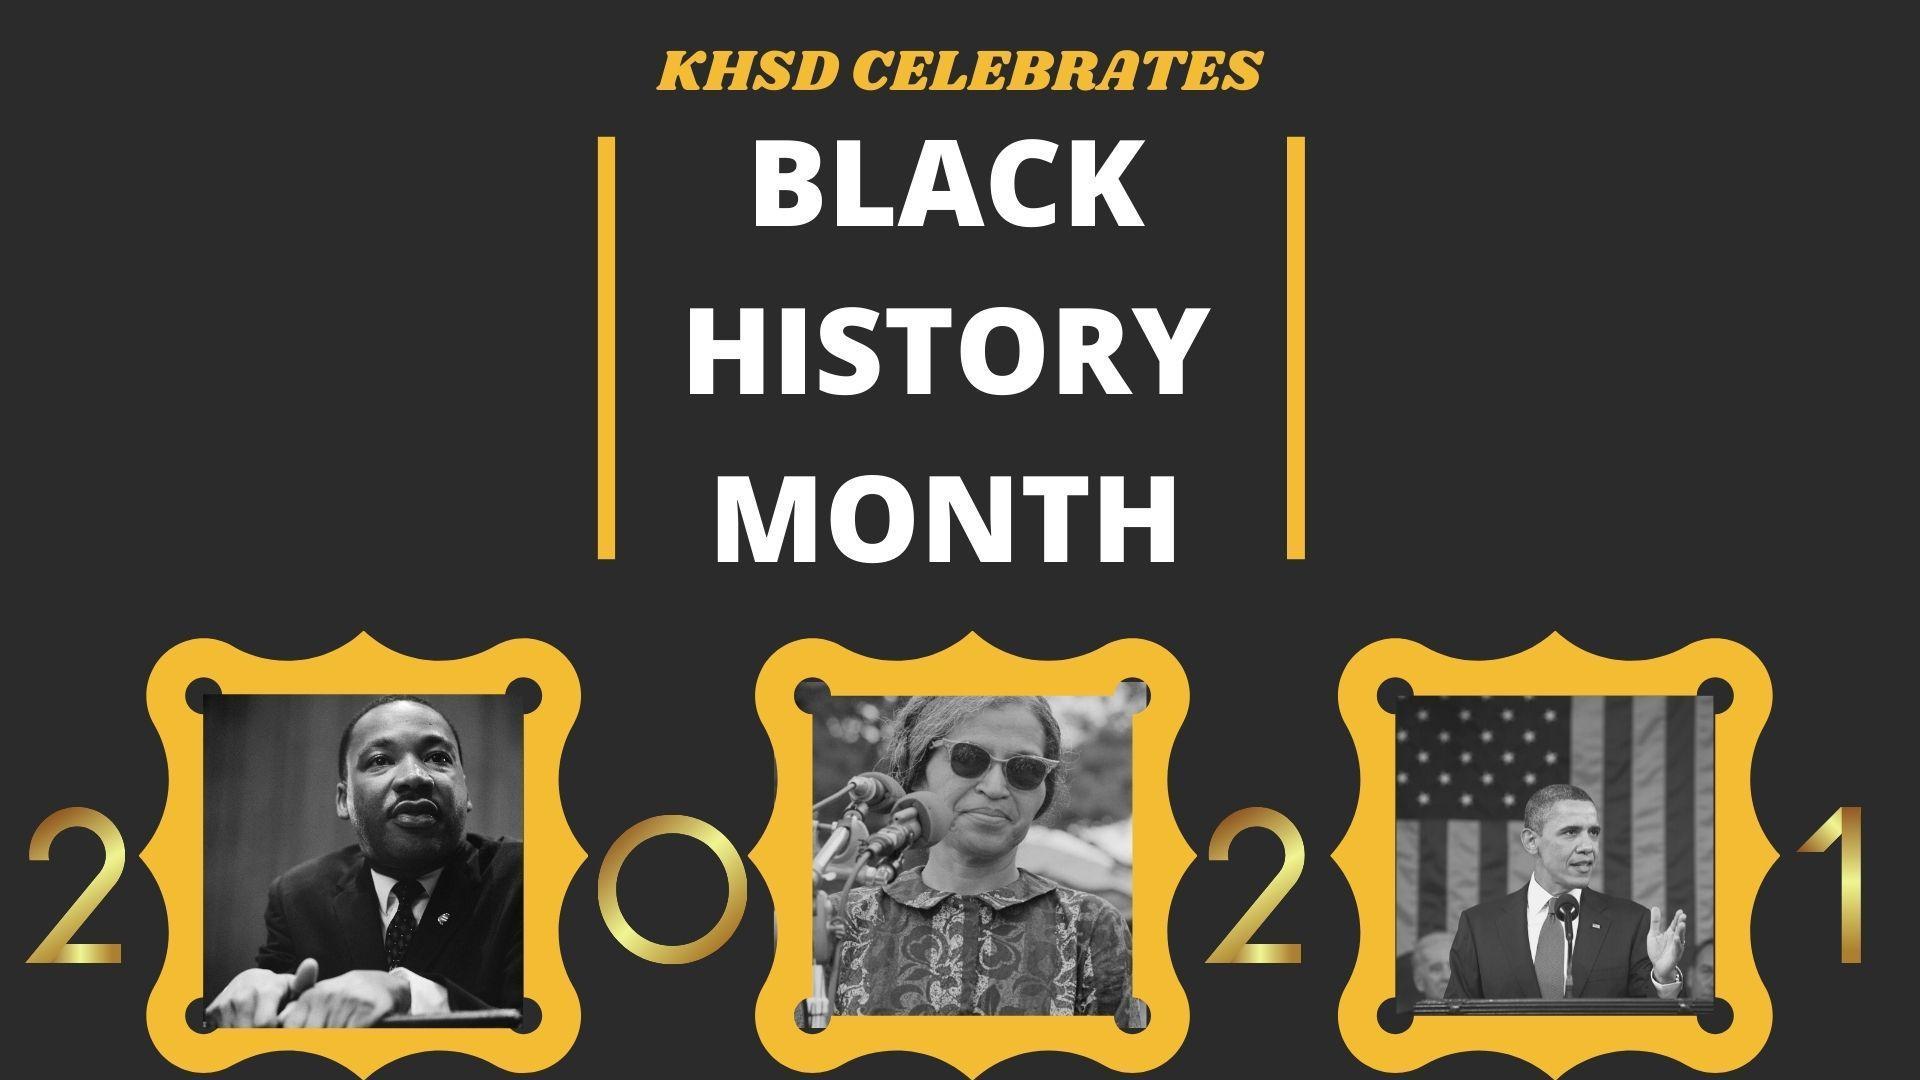 KHSD Celebrates Black History Month